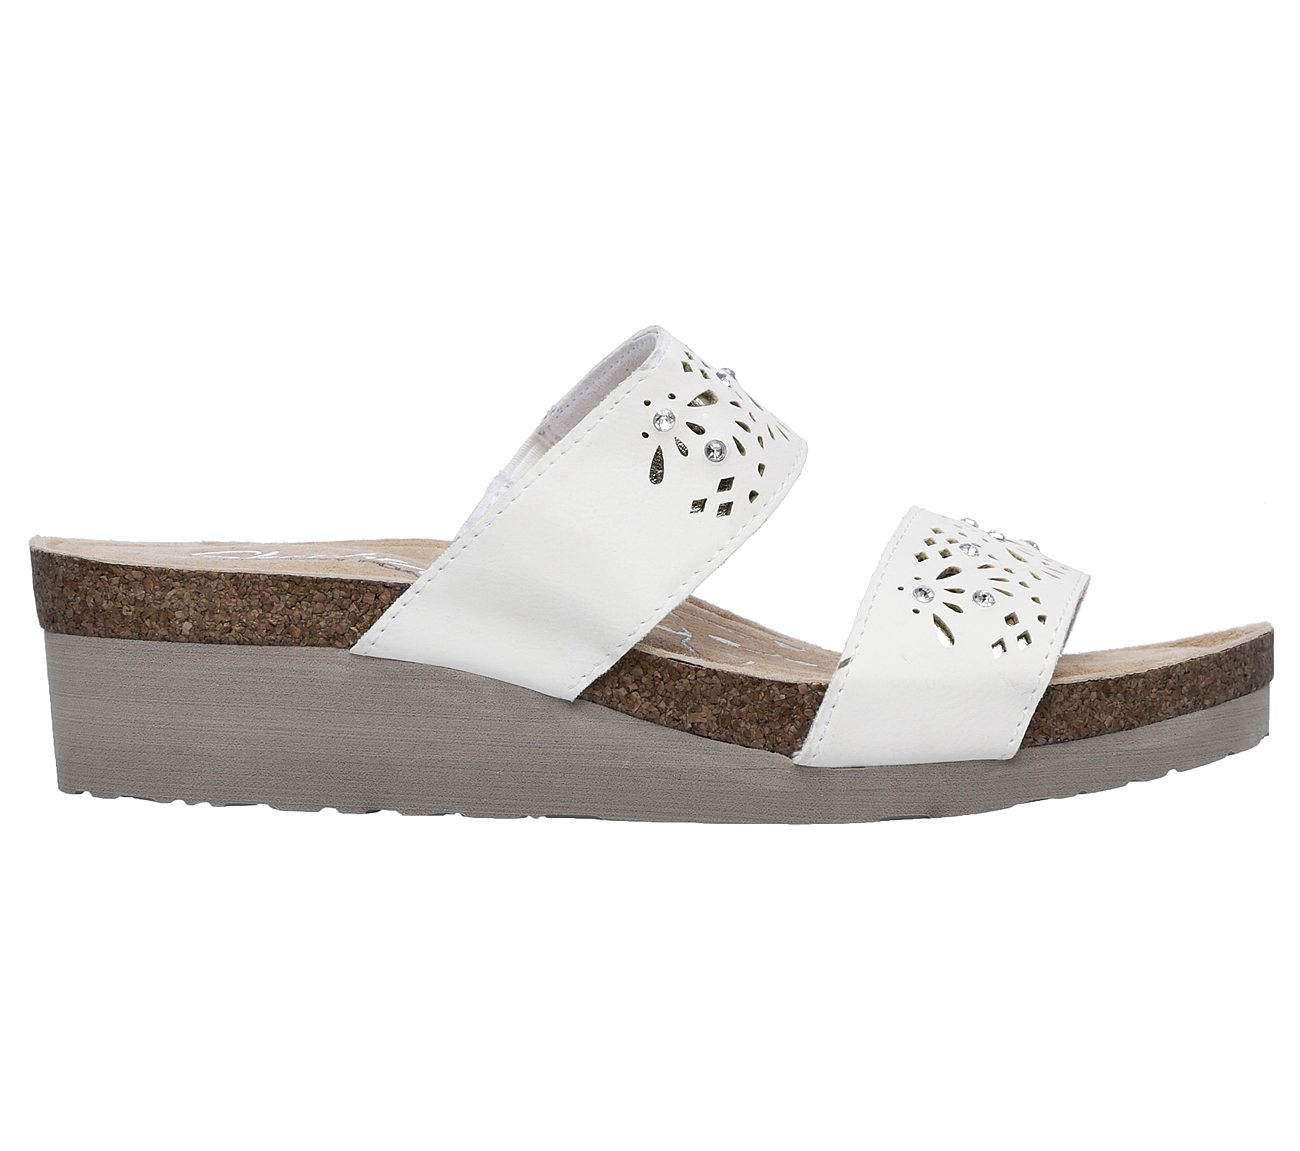 9d1b4796c765 Buy SKECHERS Troos - Skitter SKECHERS Modern Comfort Shoes only £49.00